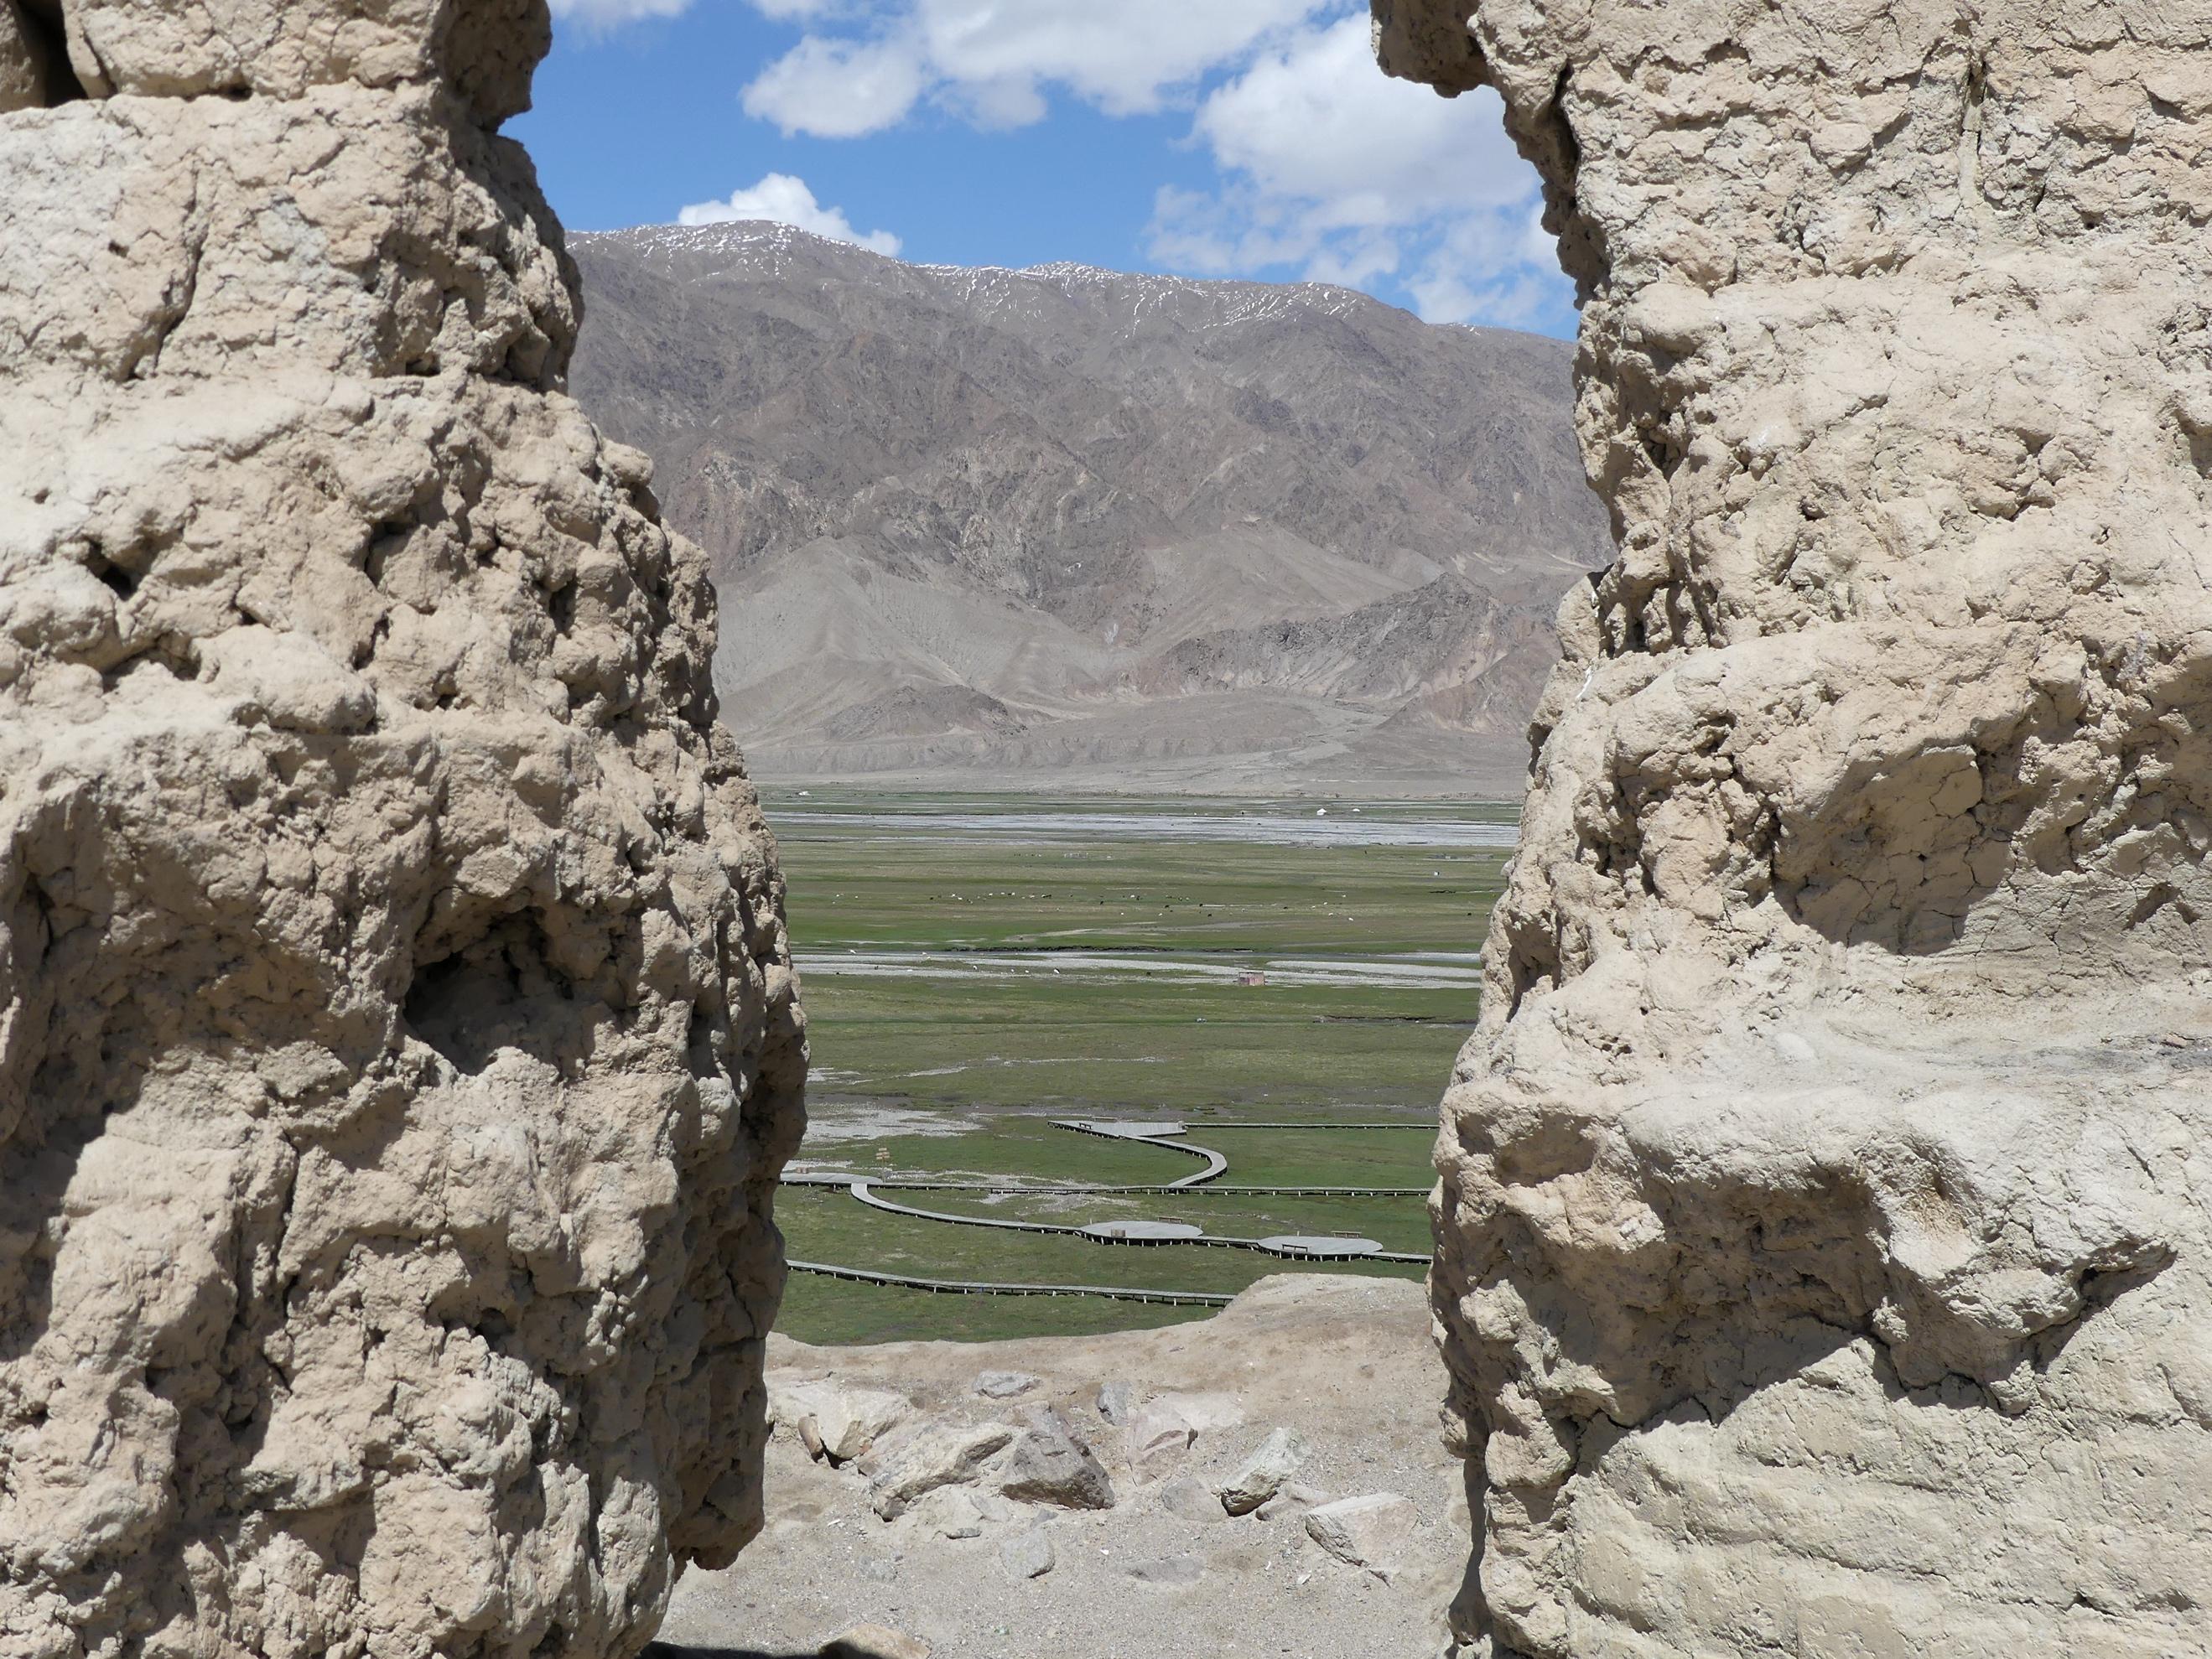 Tashkurgan, China, grasslands, from Stone Fort